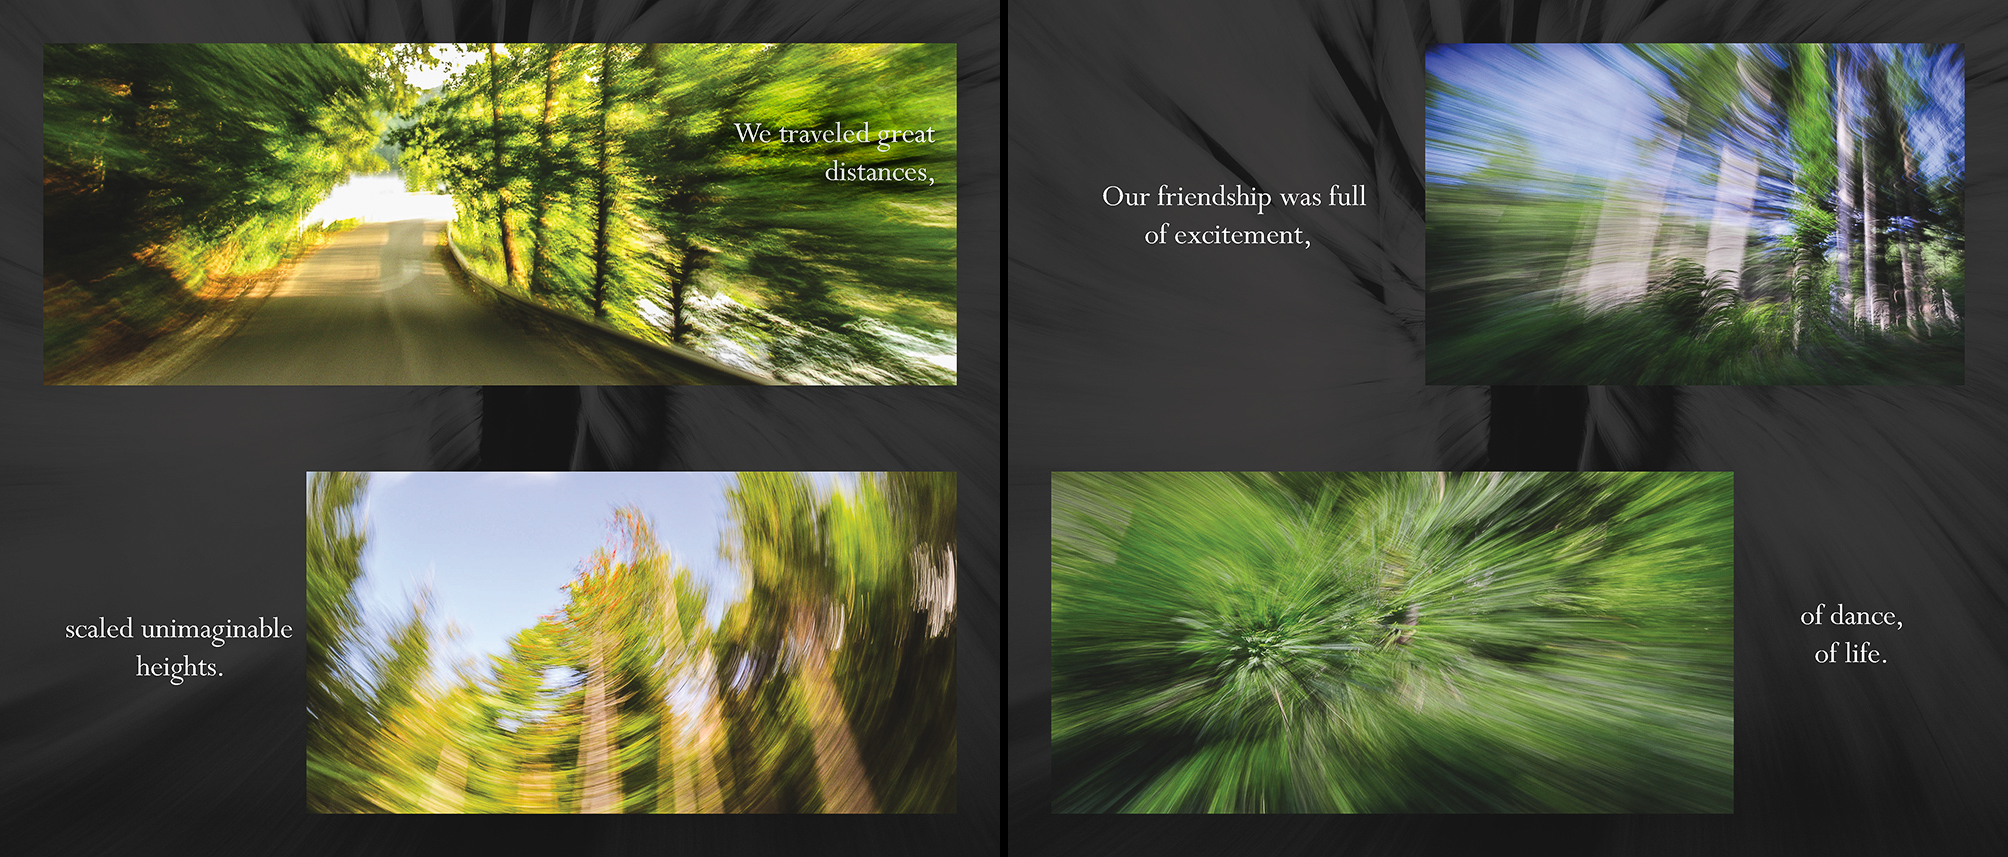 Carlin - Tree Whispers v2012_Page_07-8.jpg